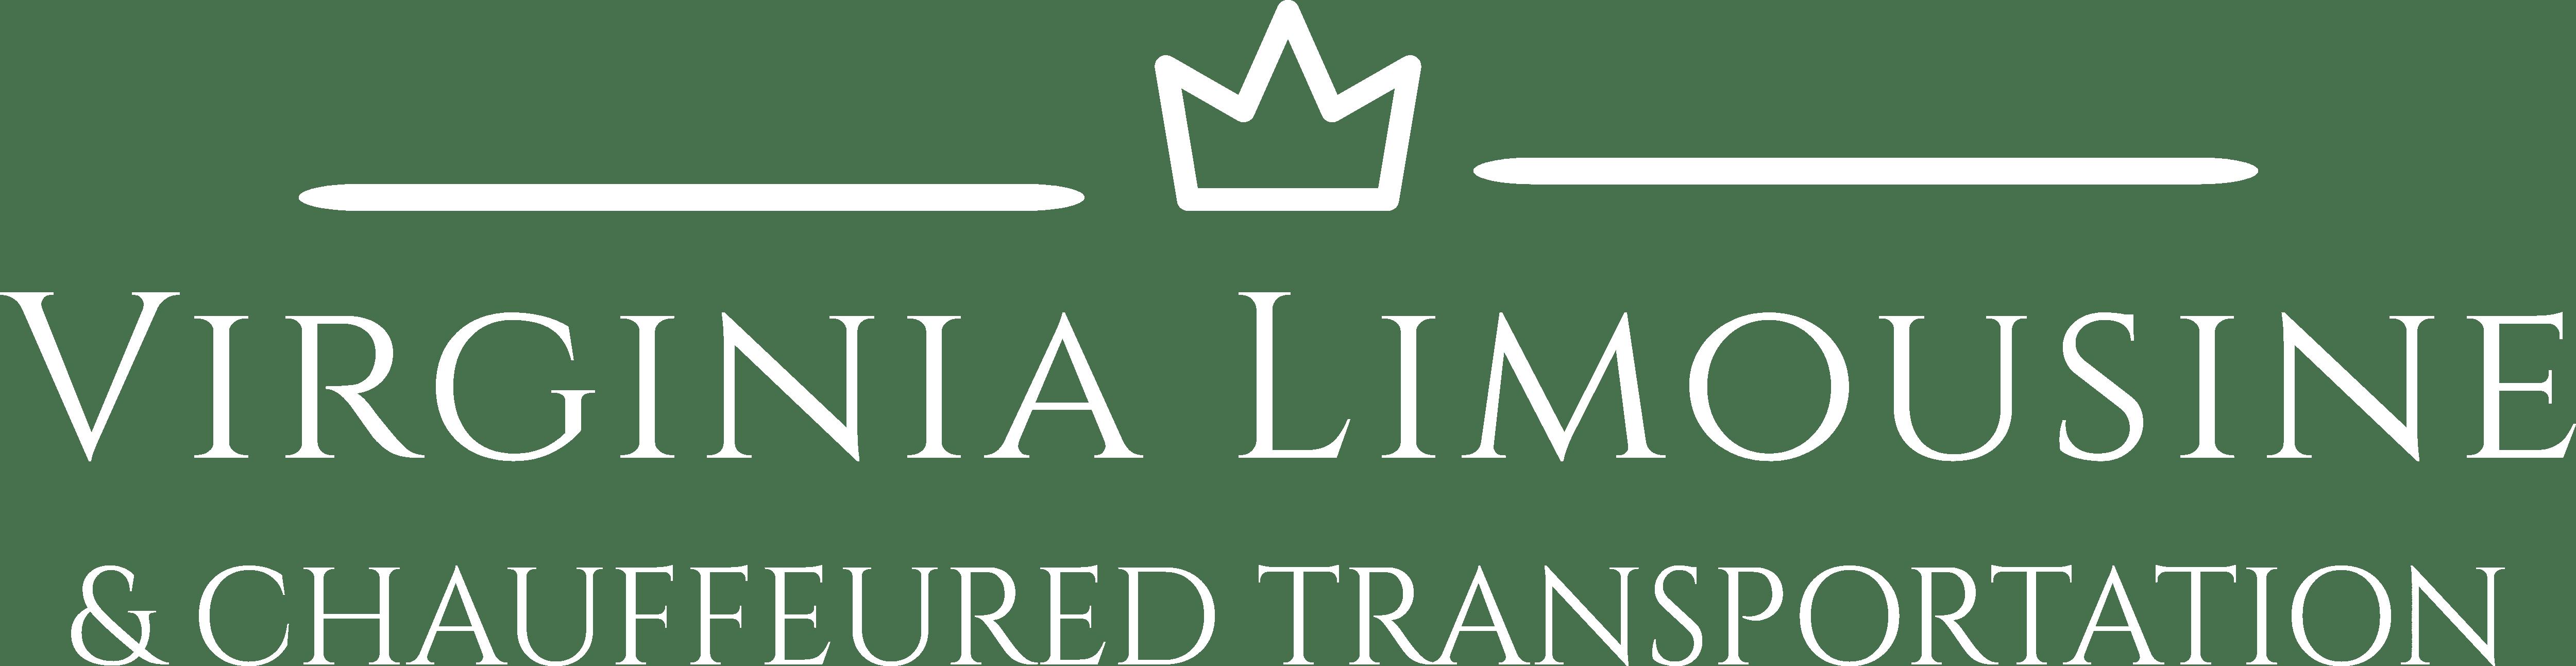 Virginia Limousine